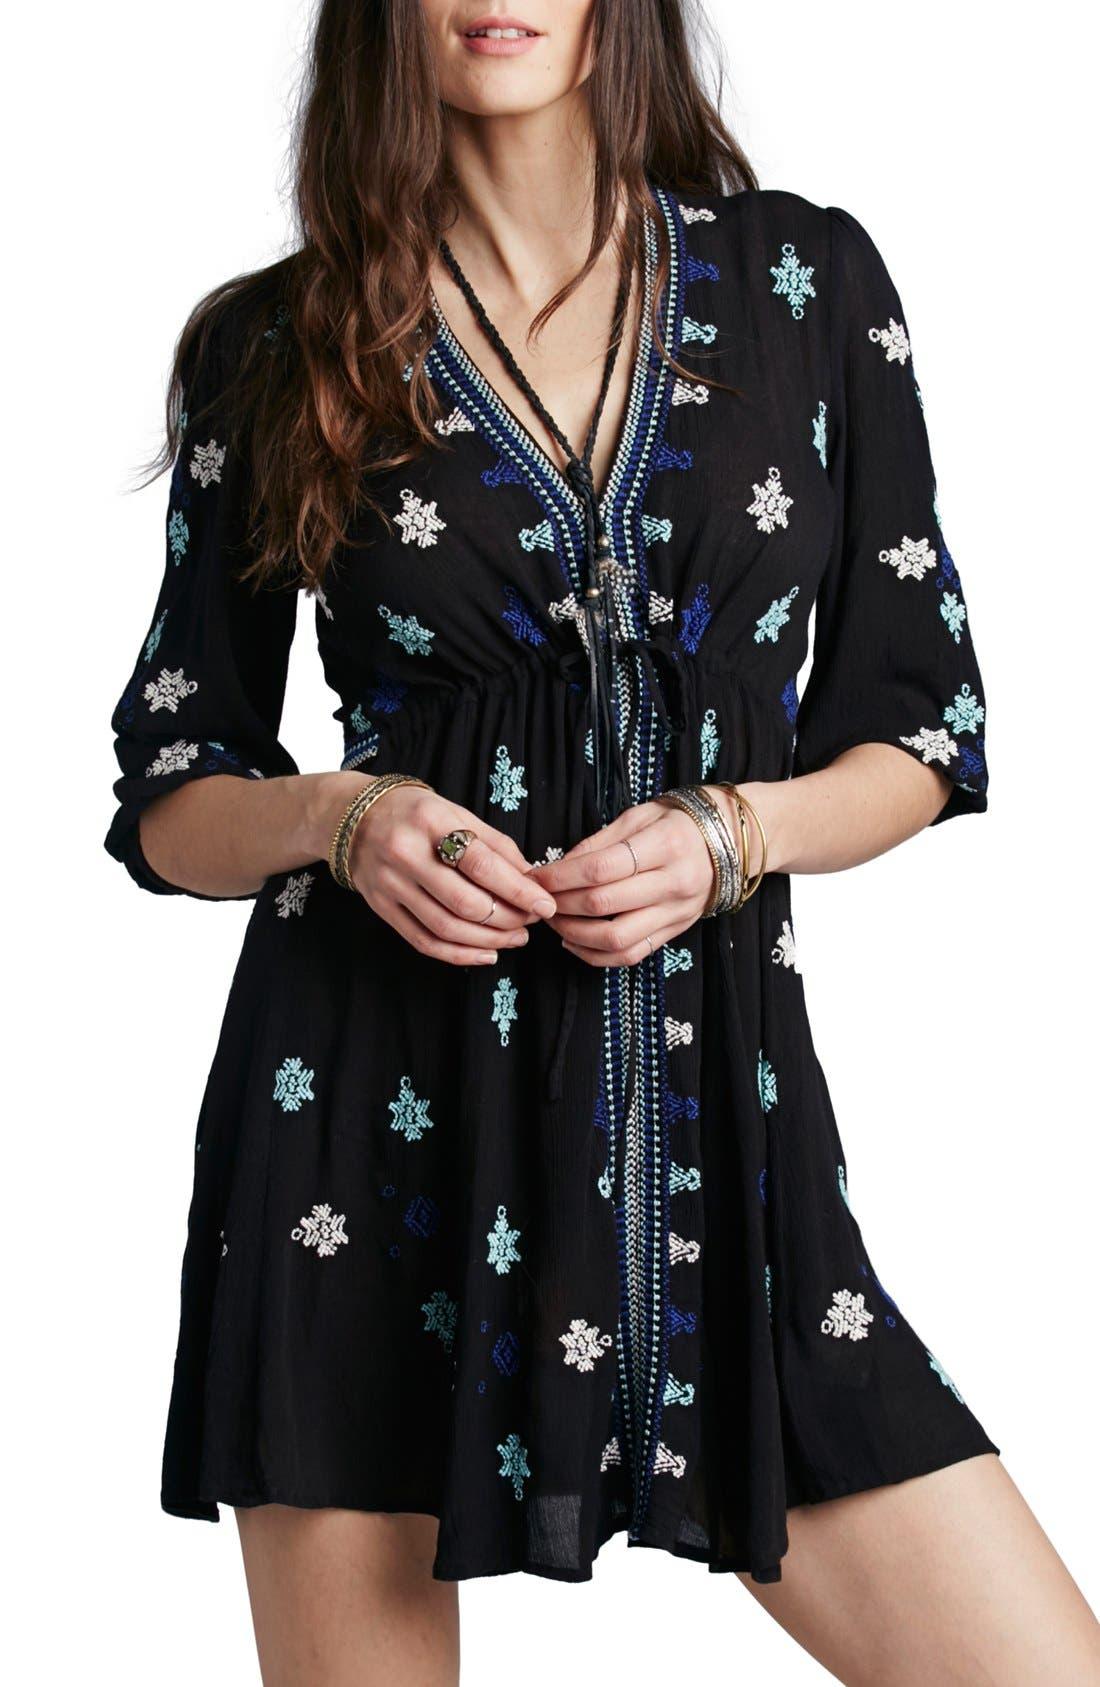 'Star Gazer' Embroidered Tunic Dress,                             Main thumbnail 1, color,                             001